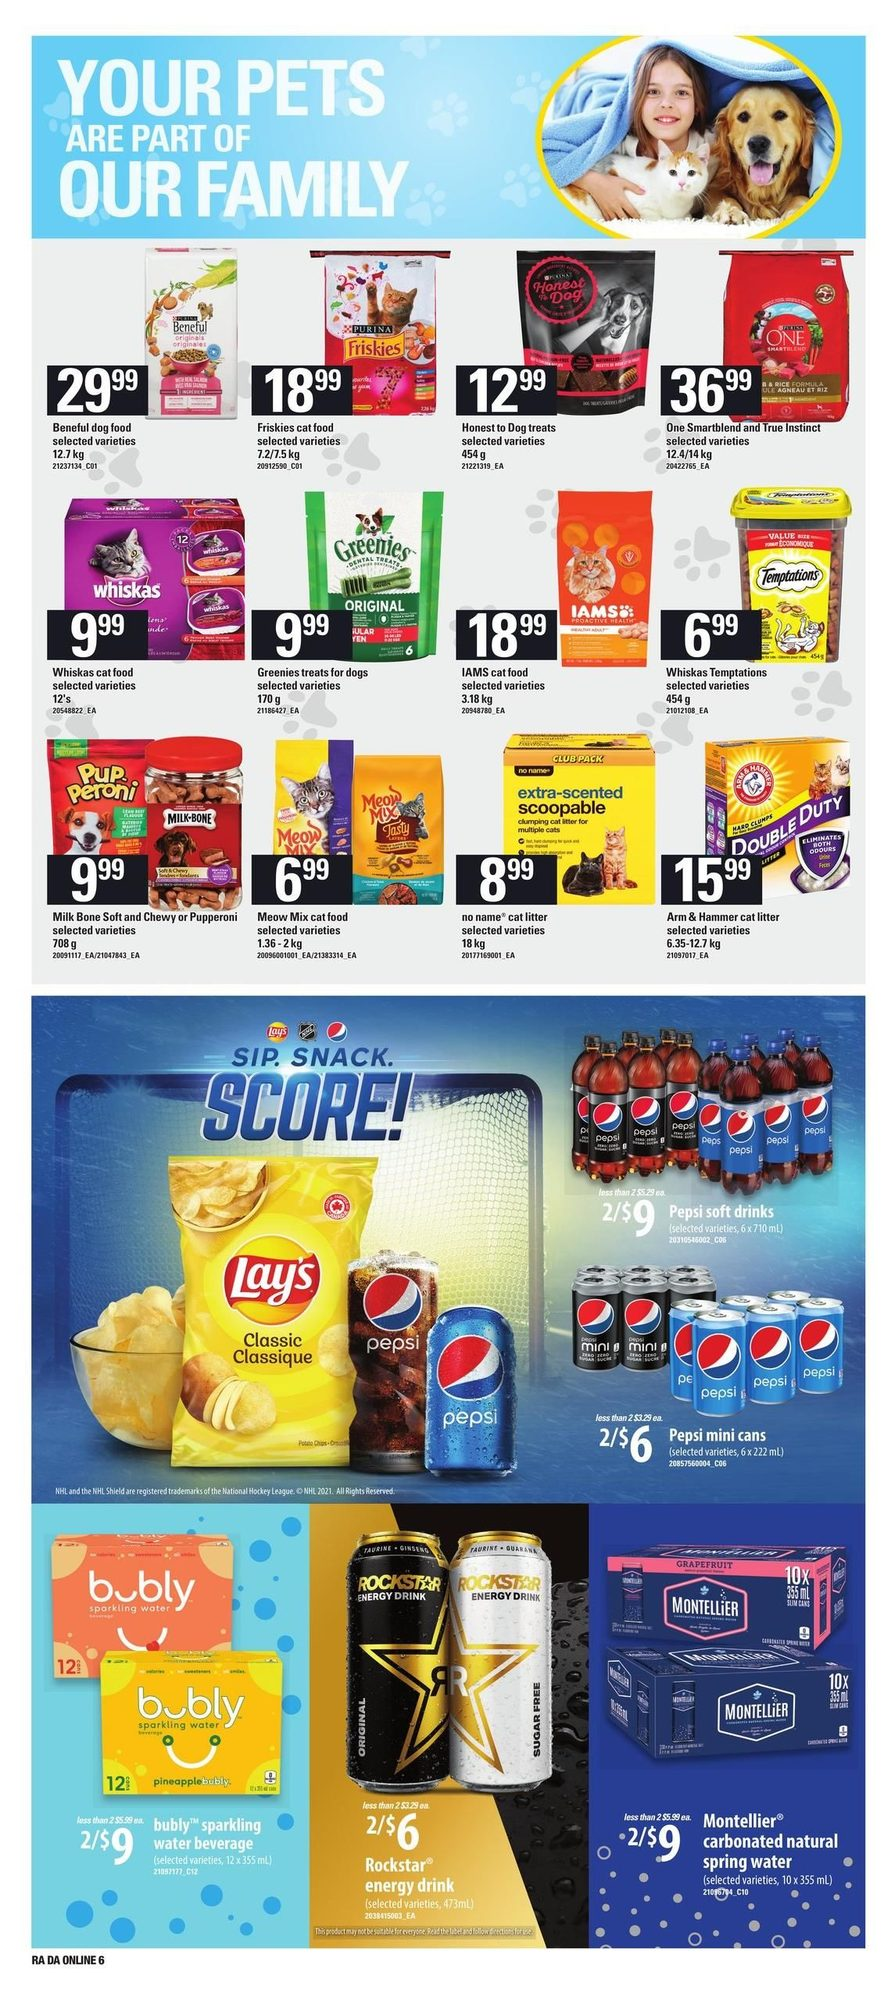 Atlantic Superstore - Weekly Flyer Specials - Page 12